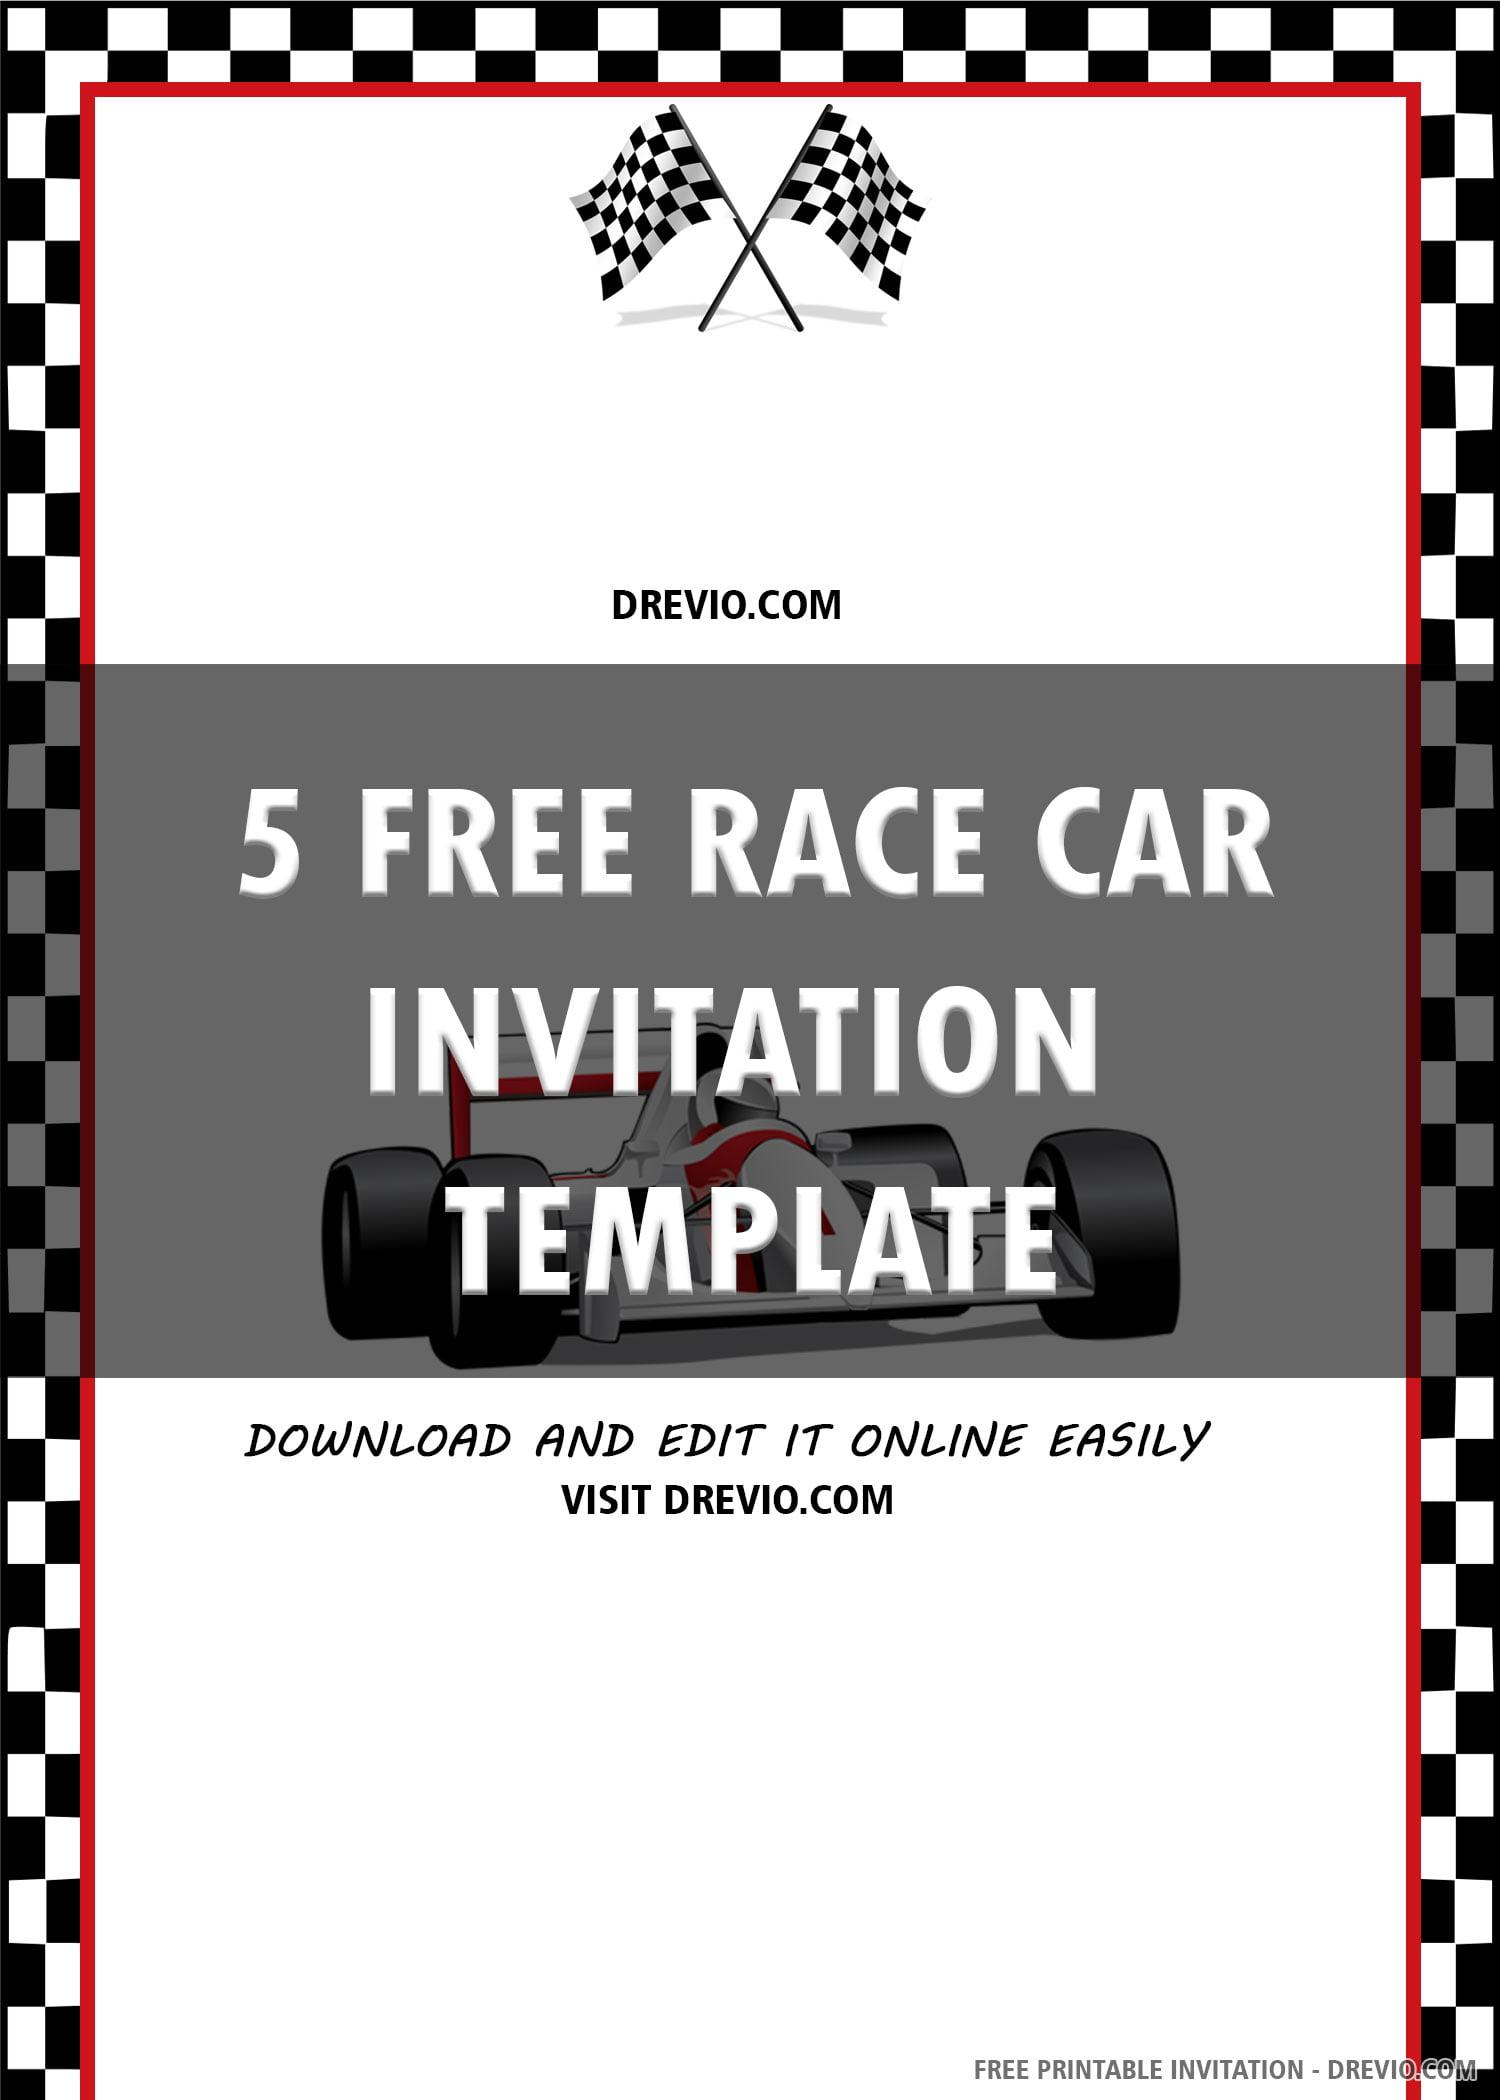 Free Printable Racing Car Birthday Invitation Template